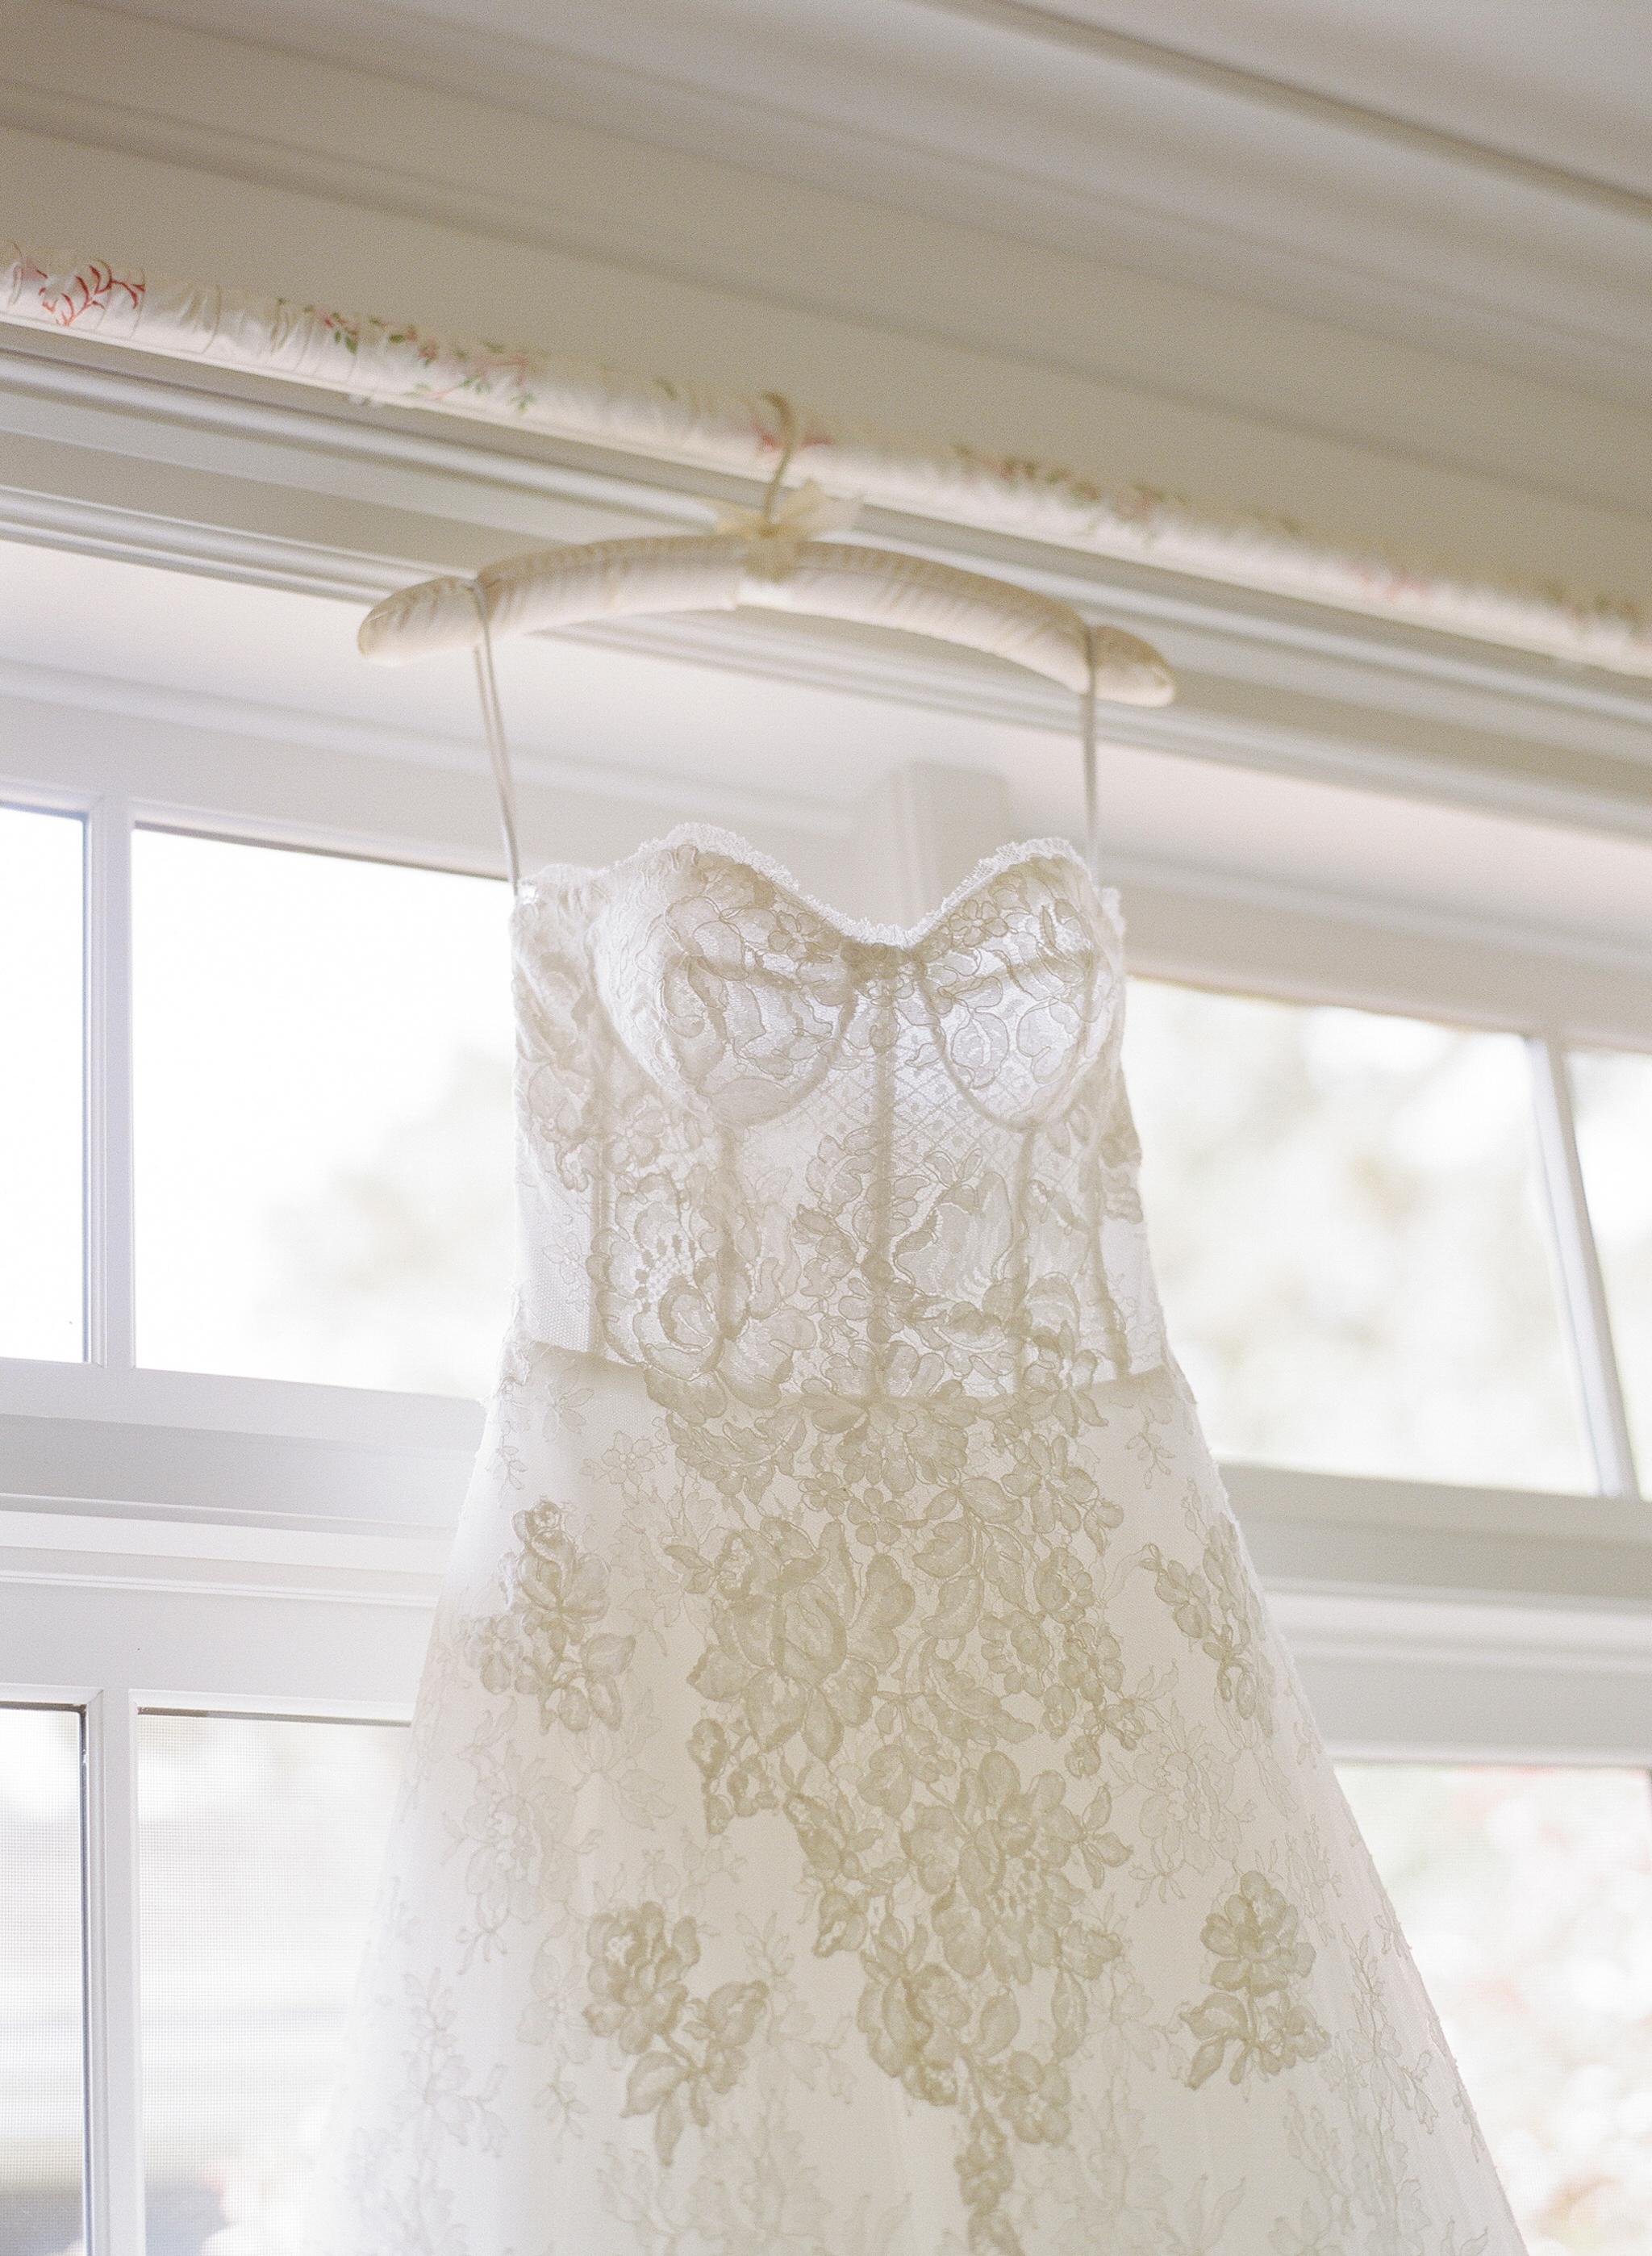 A Photo of a White Dress